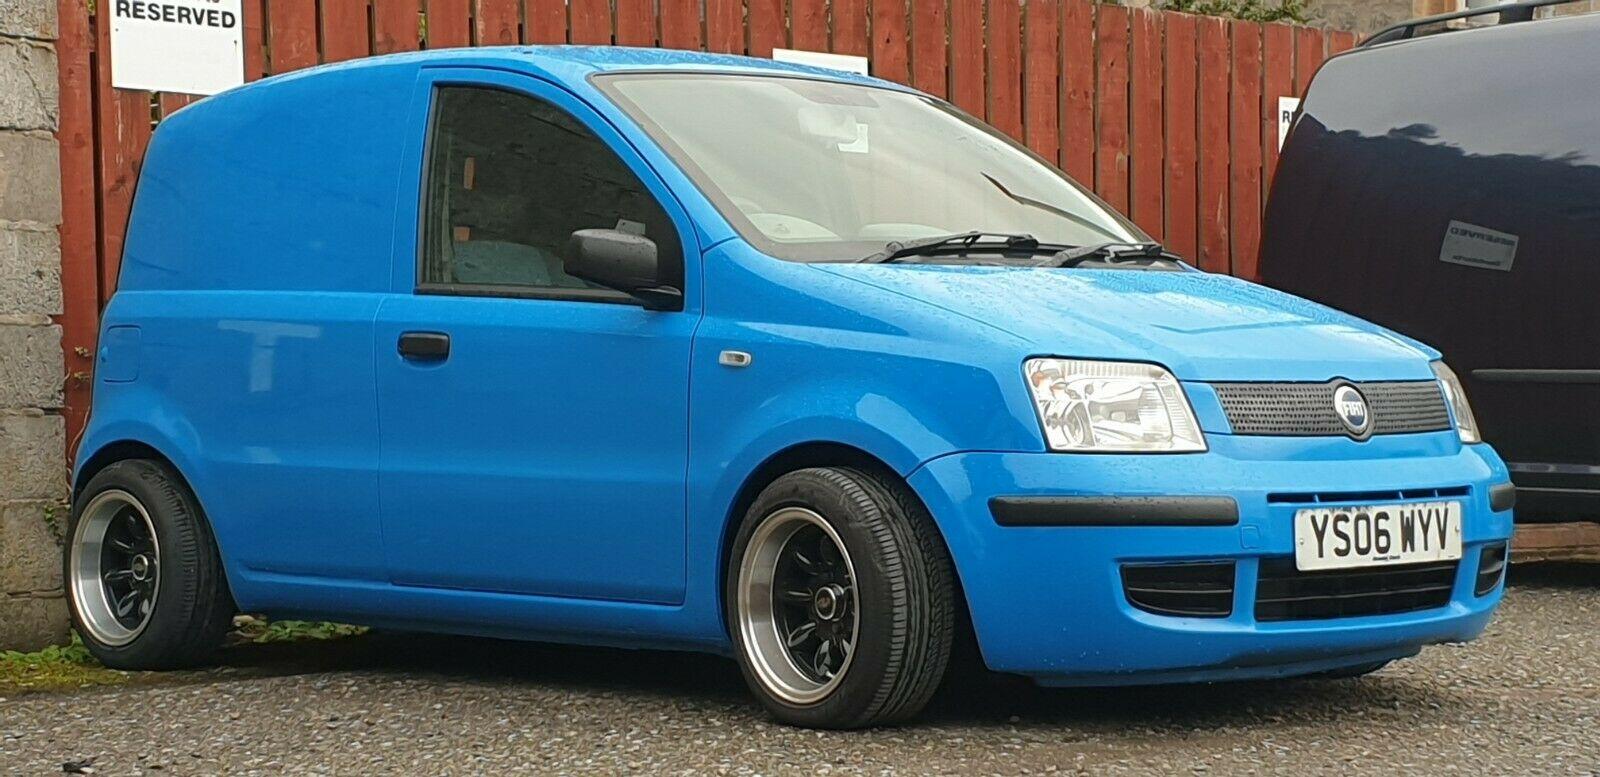 Modified Fiat Panda Van